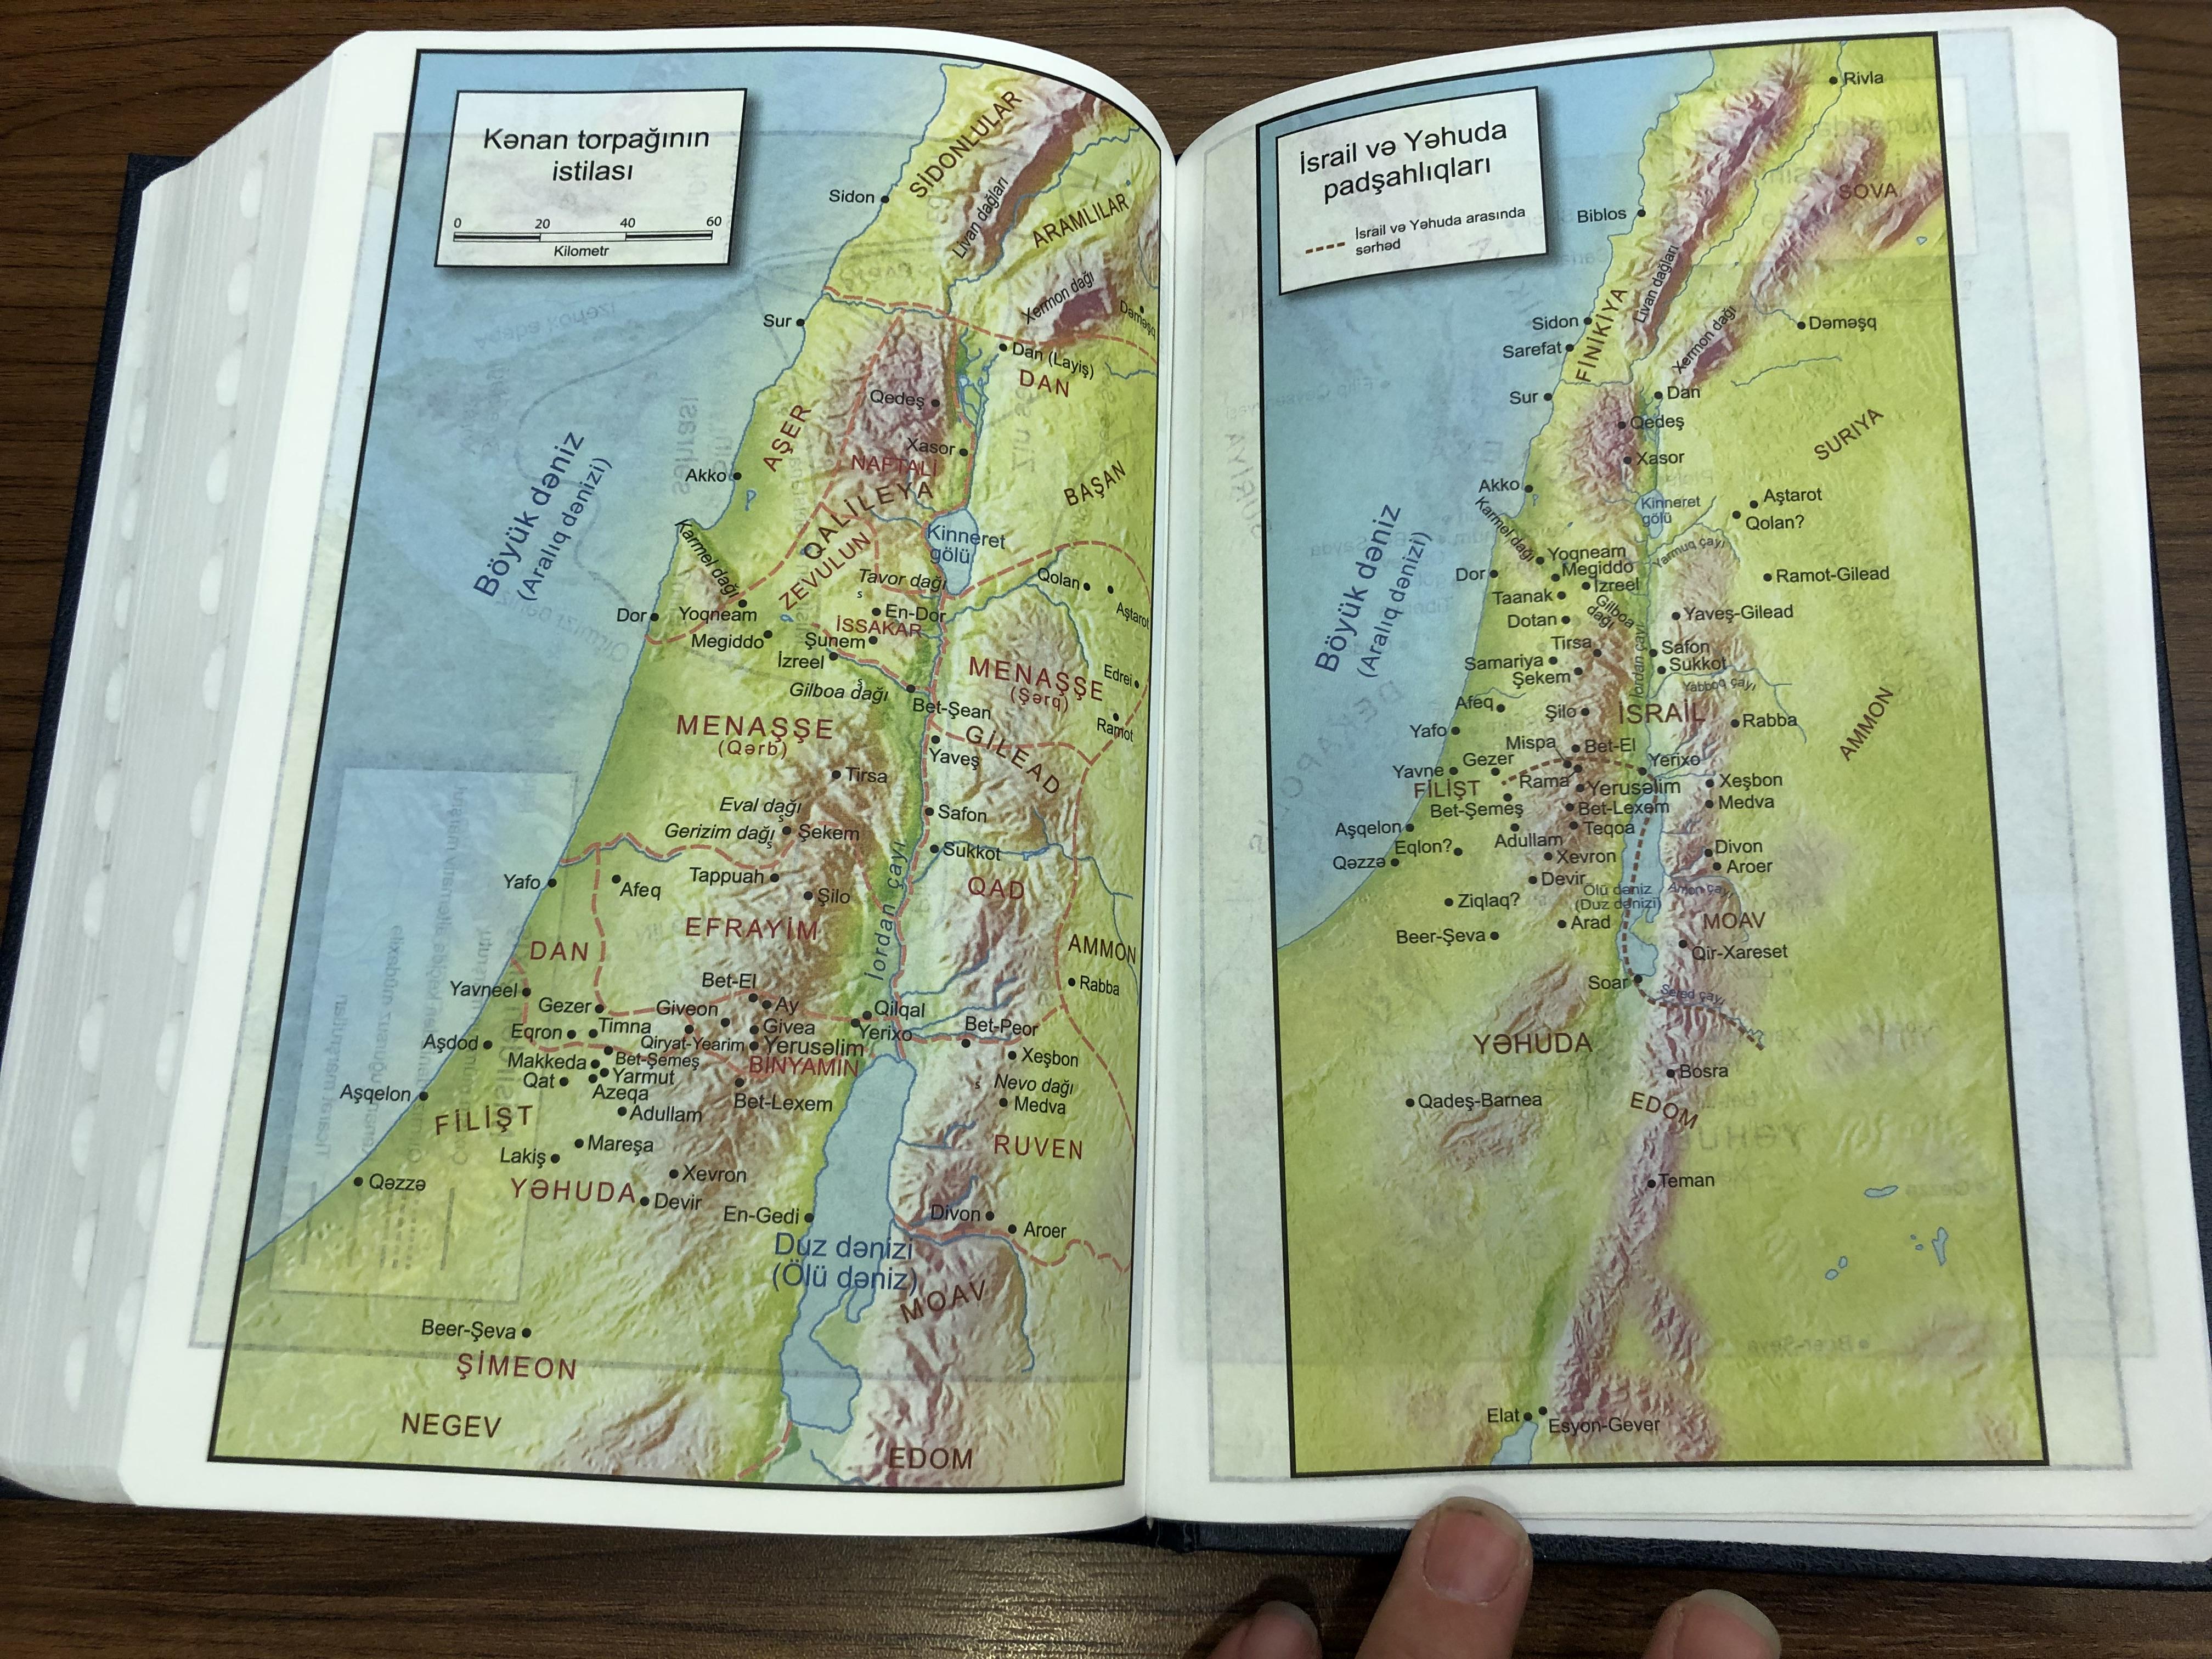 bibliya-azeri-language-with-thumb-index-and-color-maps-text-azerbaijani-latin-a063ti-18-.jpg